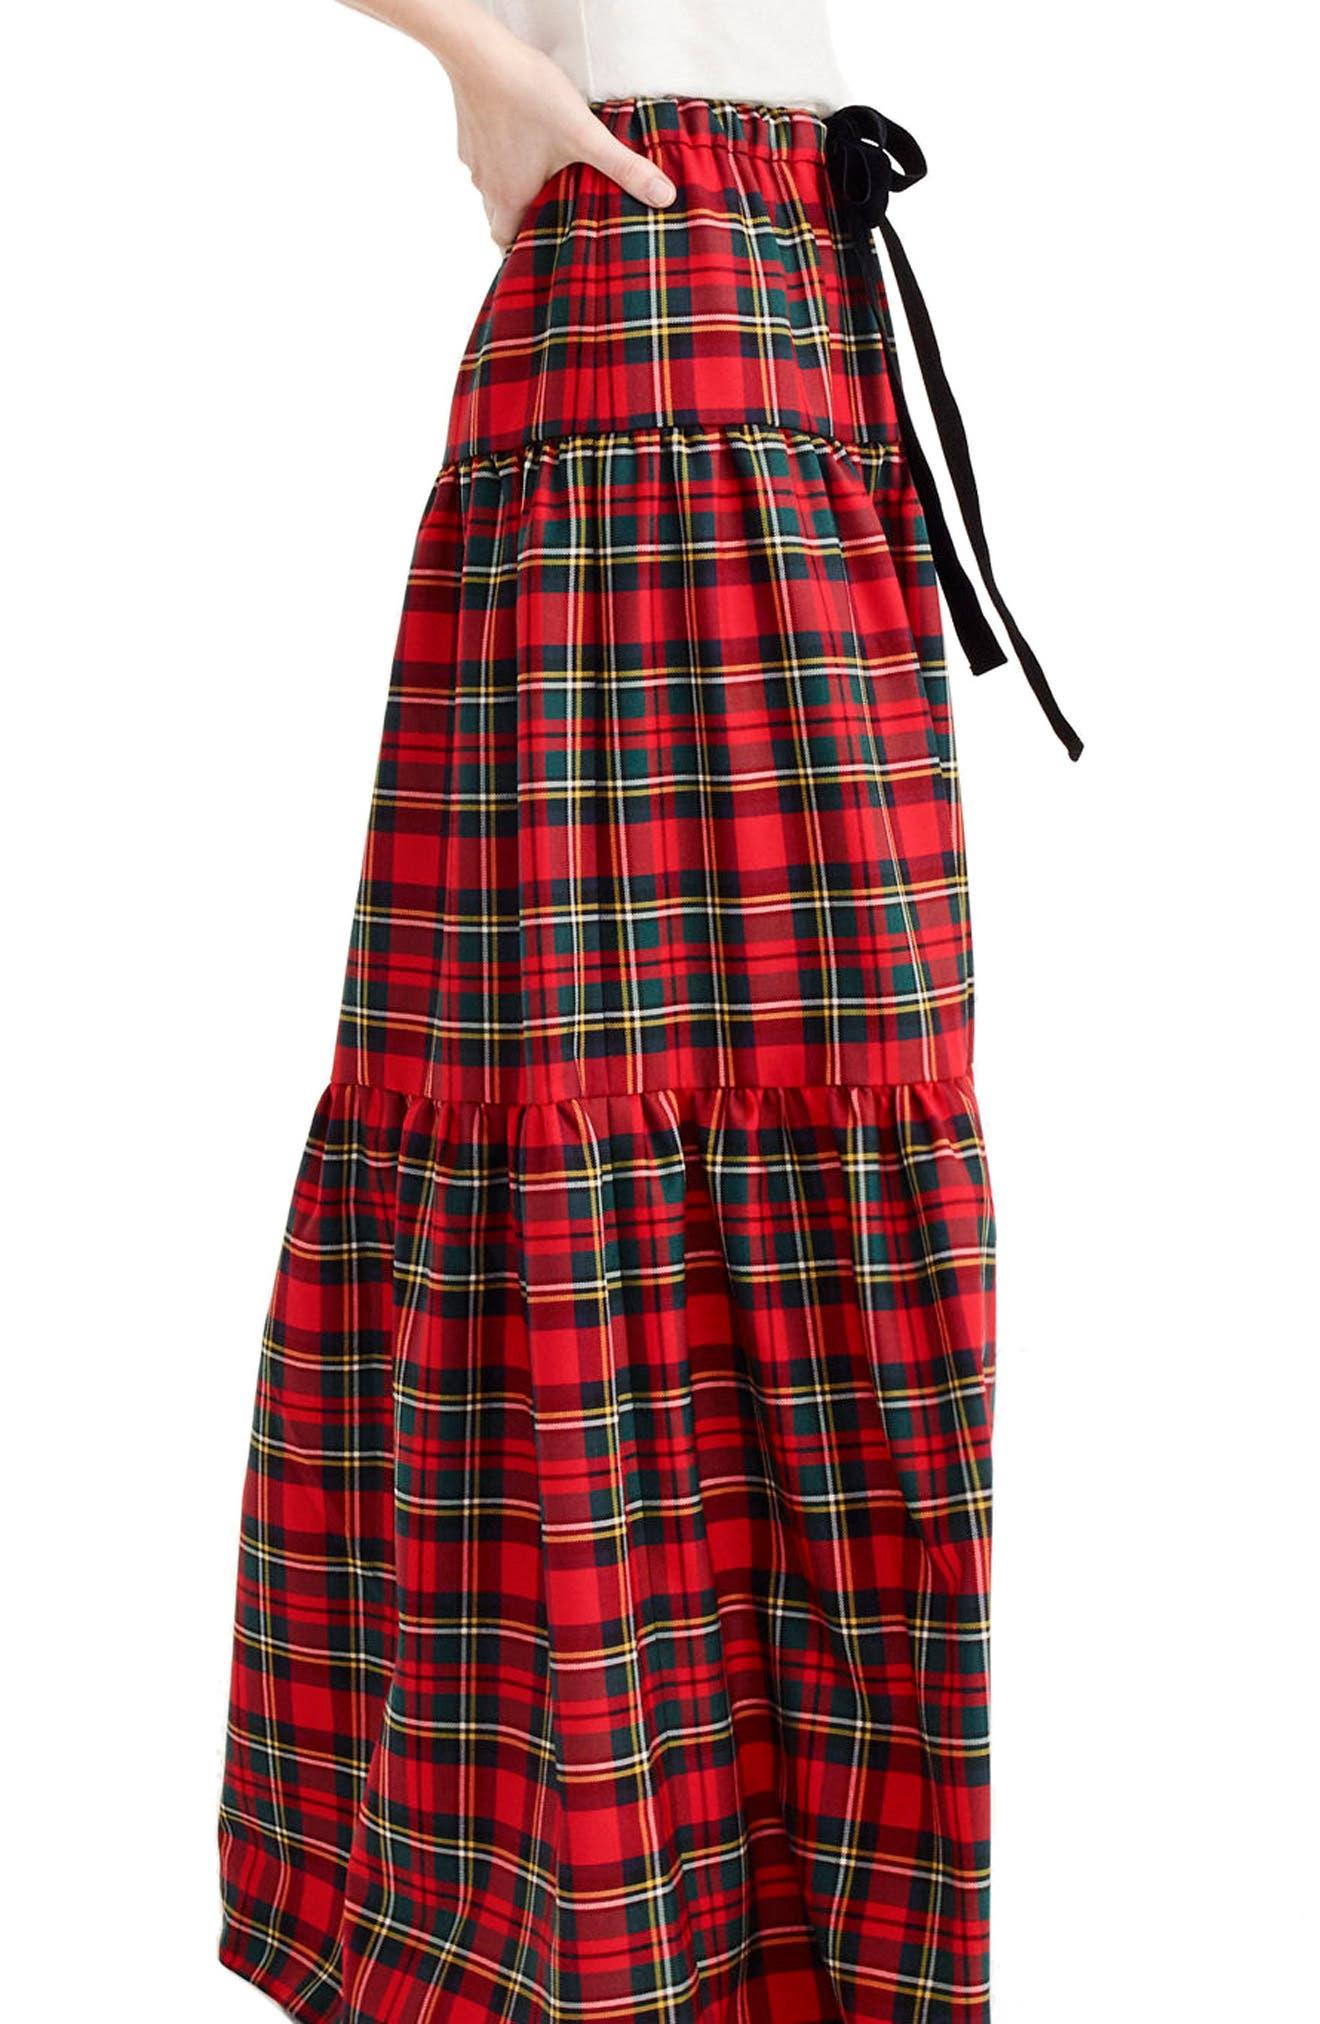 Tartan Plaid Tiered Maxi Skirt,                             Alternate thumbnail 2, color,                             600